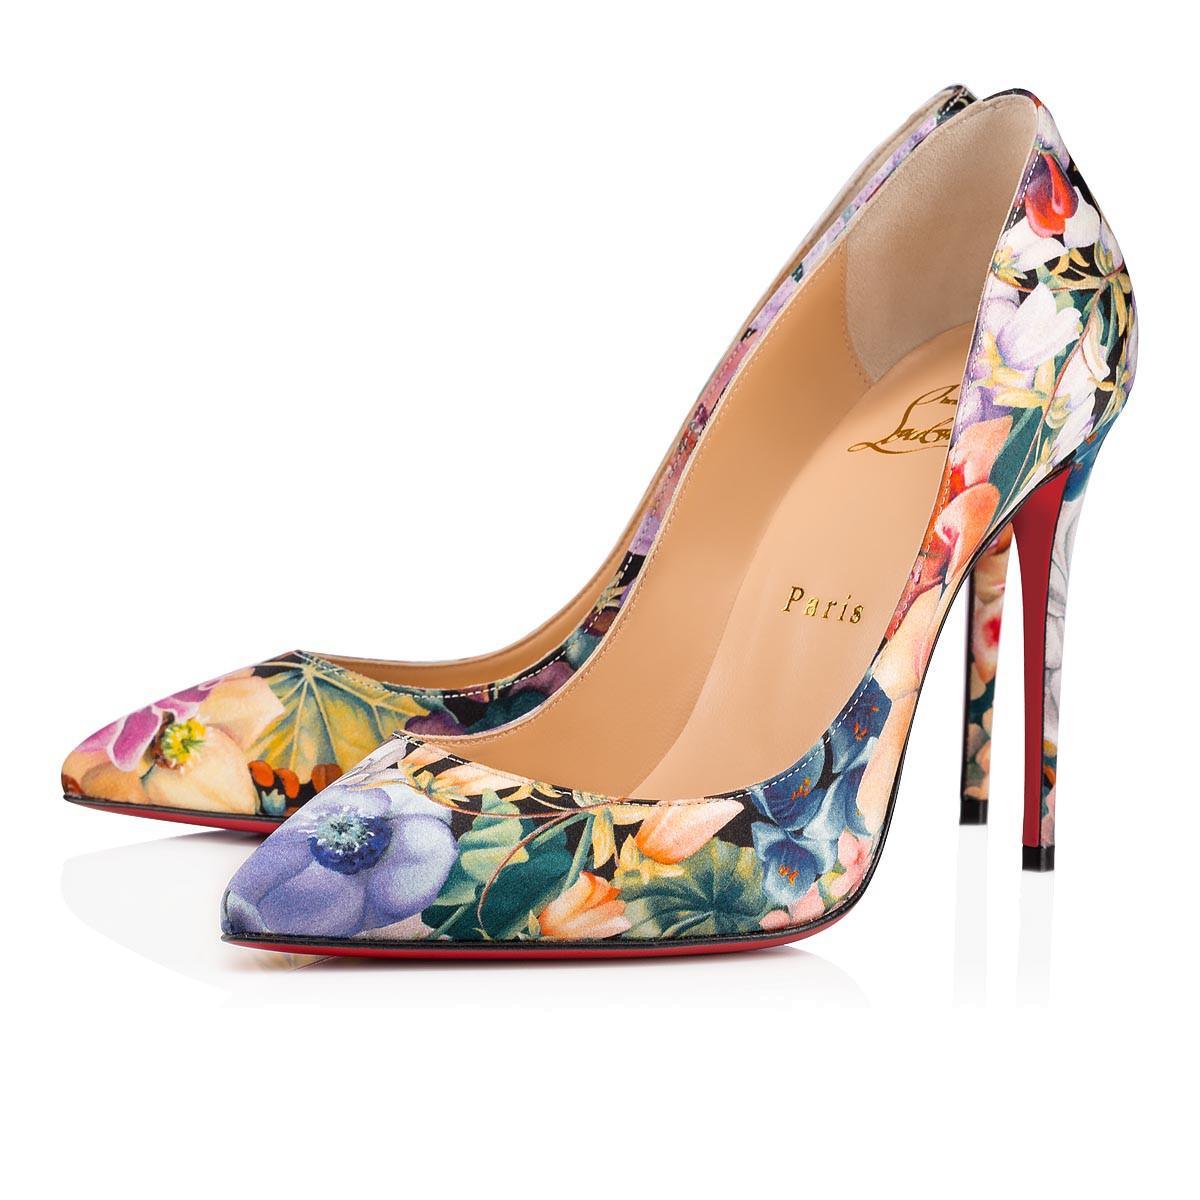 Scarpe eleganti a fiori Christian Louboutin